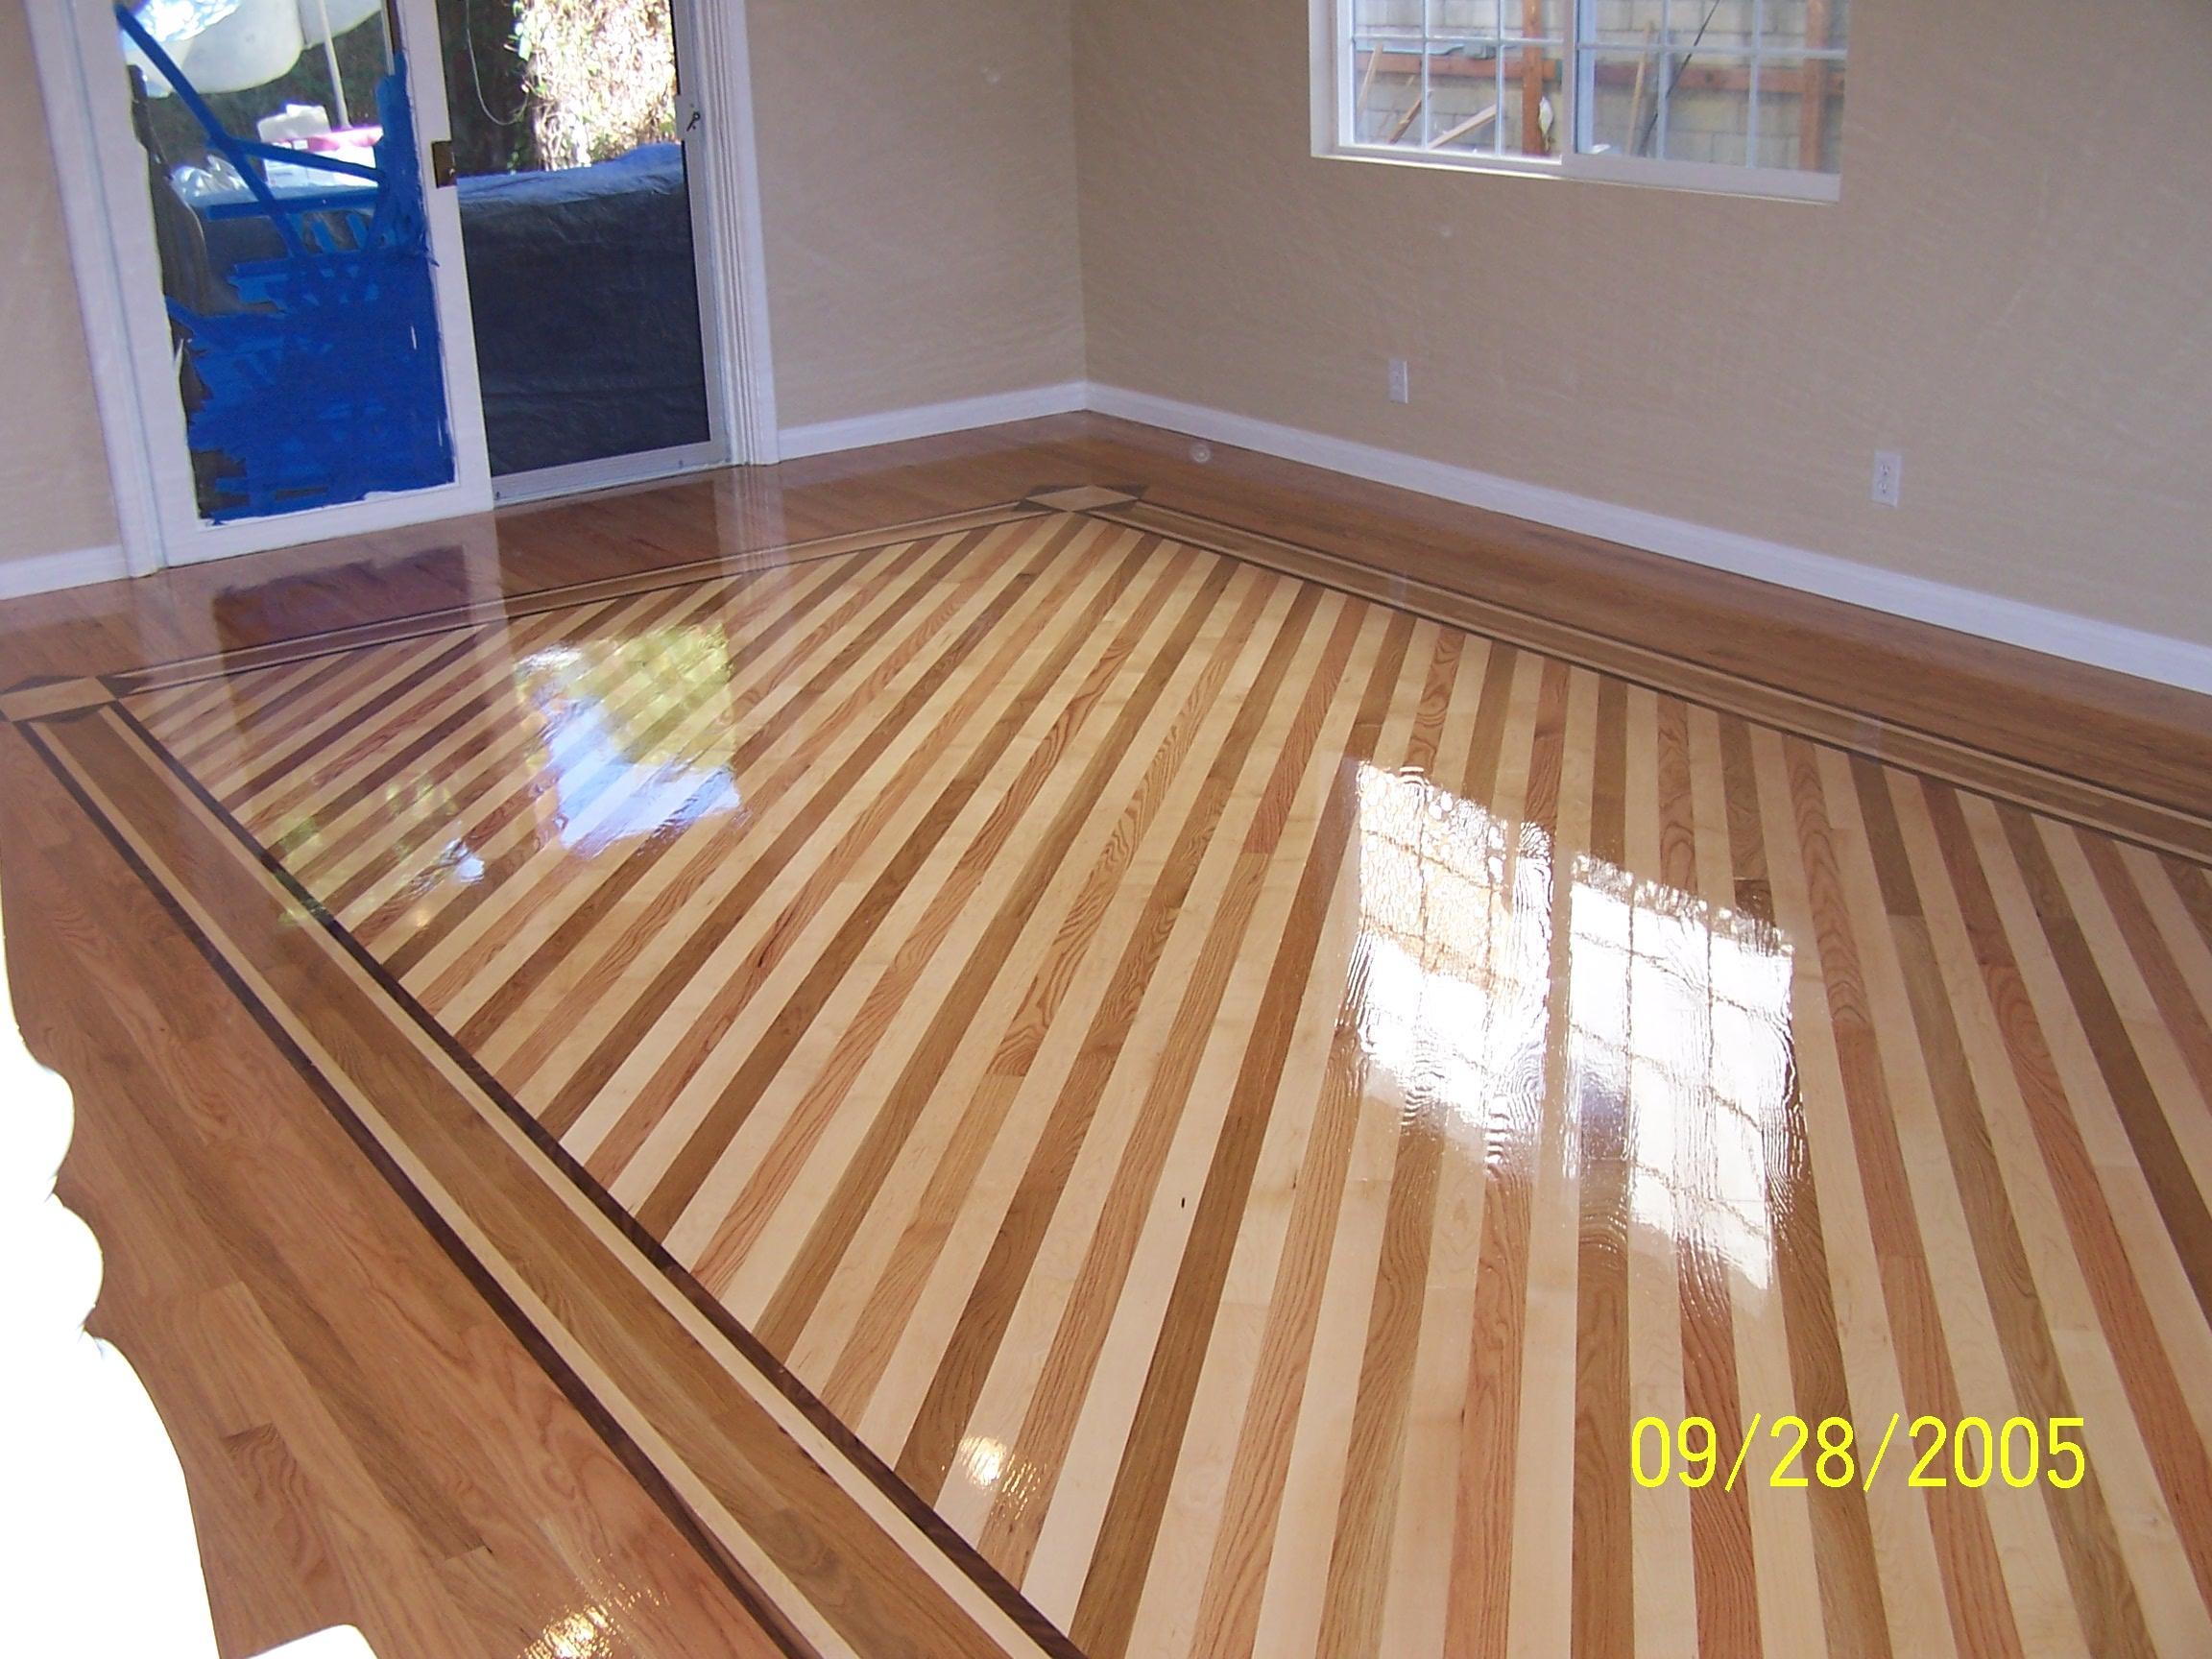 almahdi hardwood flooring in sherman oaks ca 91423 ForFlooring Sherman Oaks